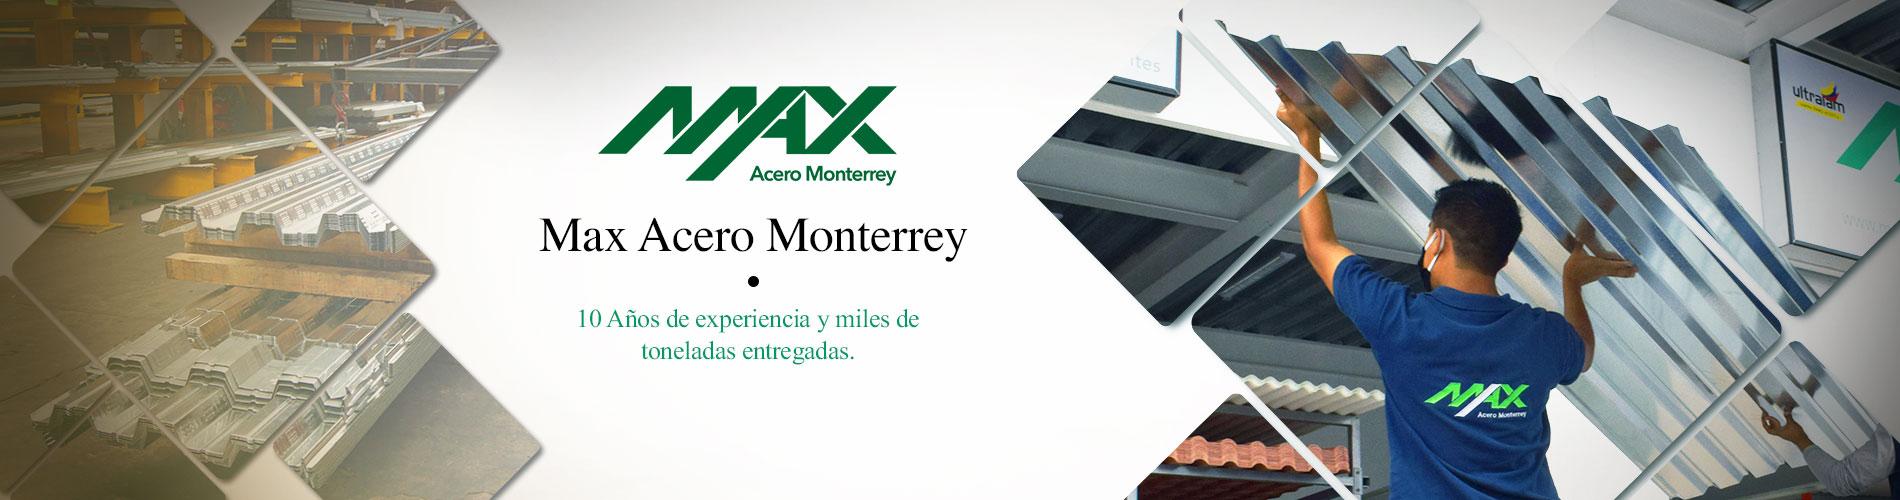 max-acero-monterrey-banner